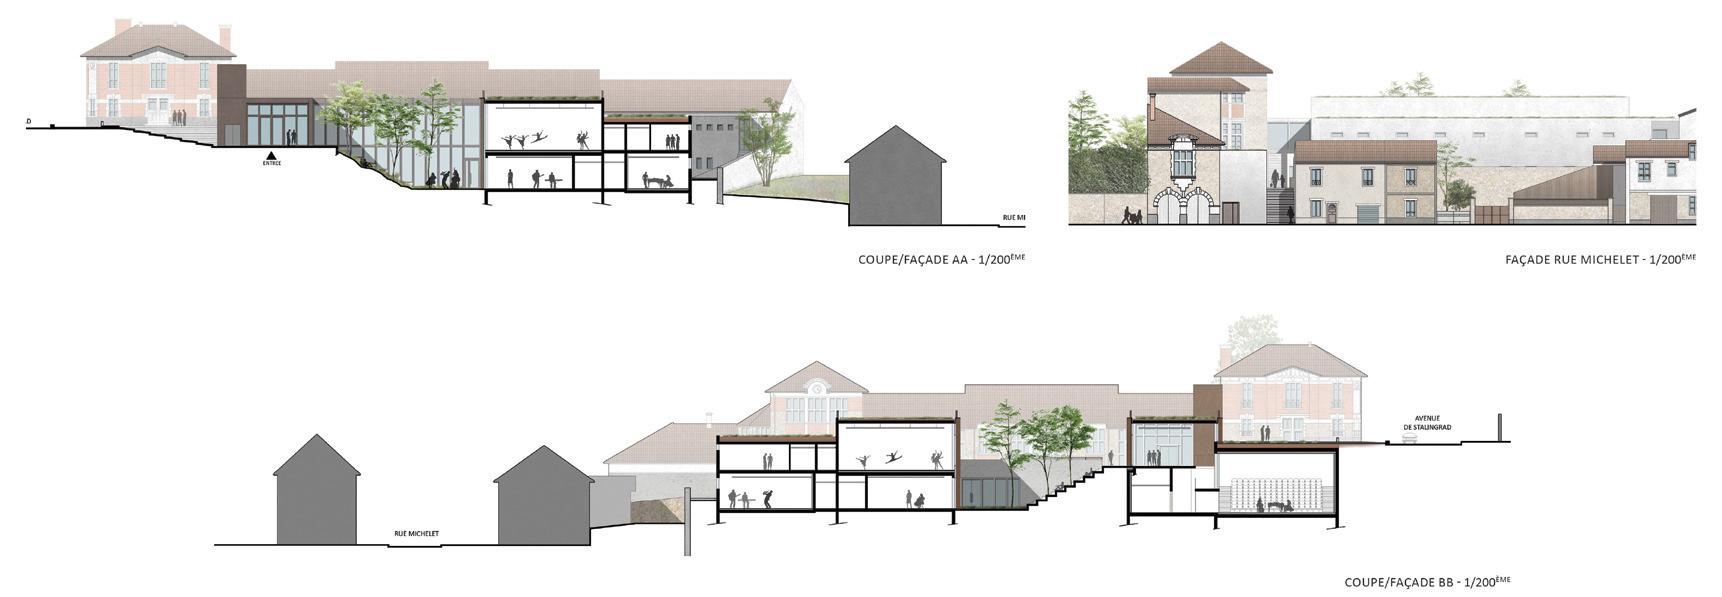 palaiseau_conservatory_public_outdoor_design_christophe_gautrand_landscape_6.jpg